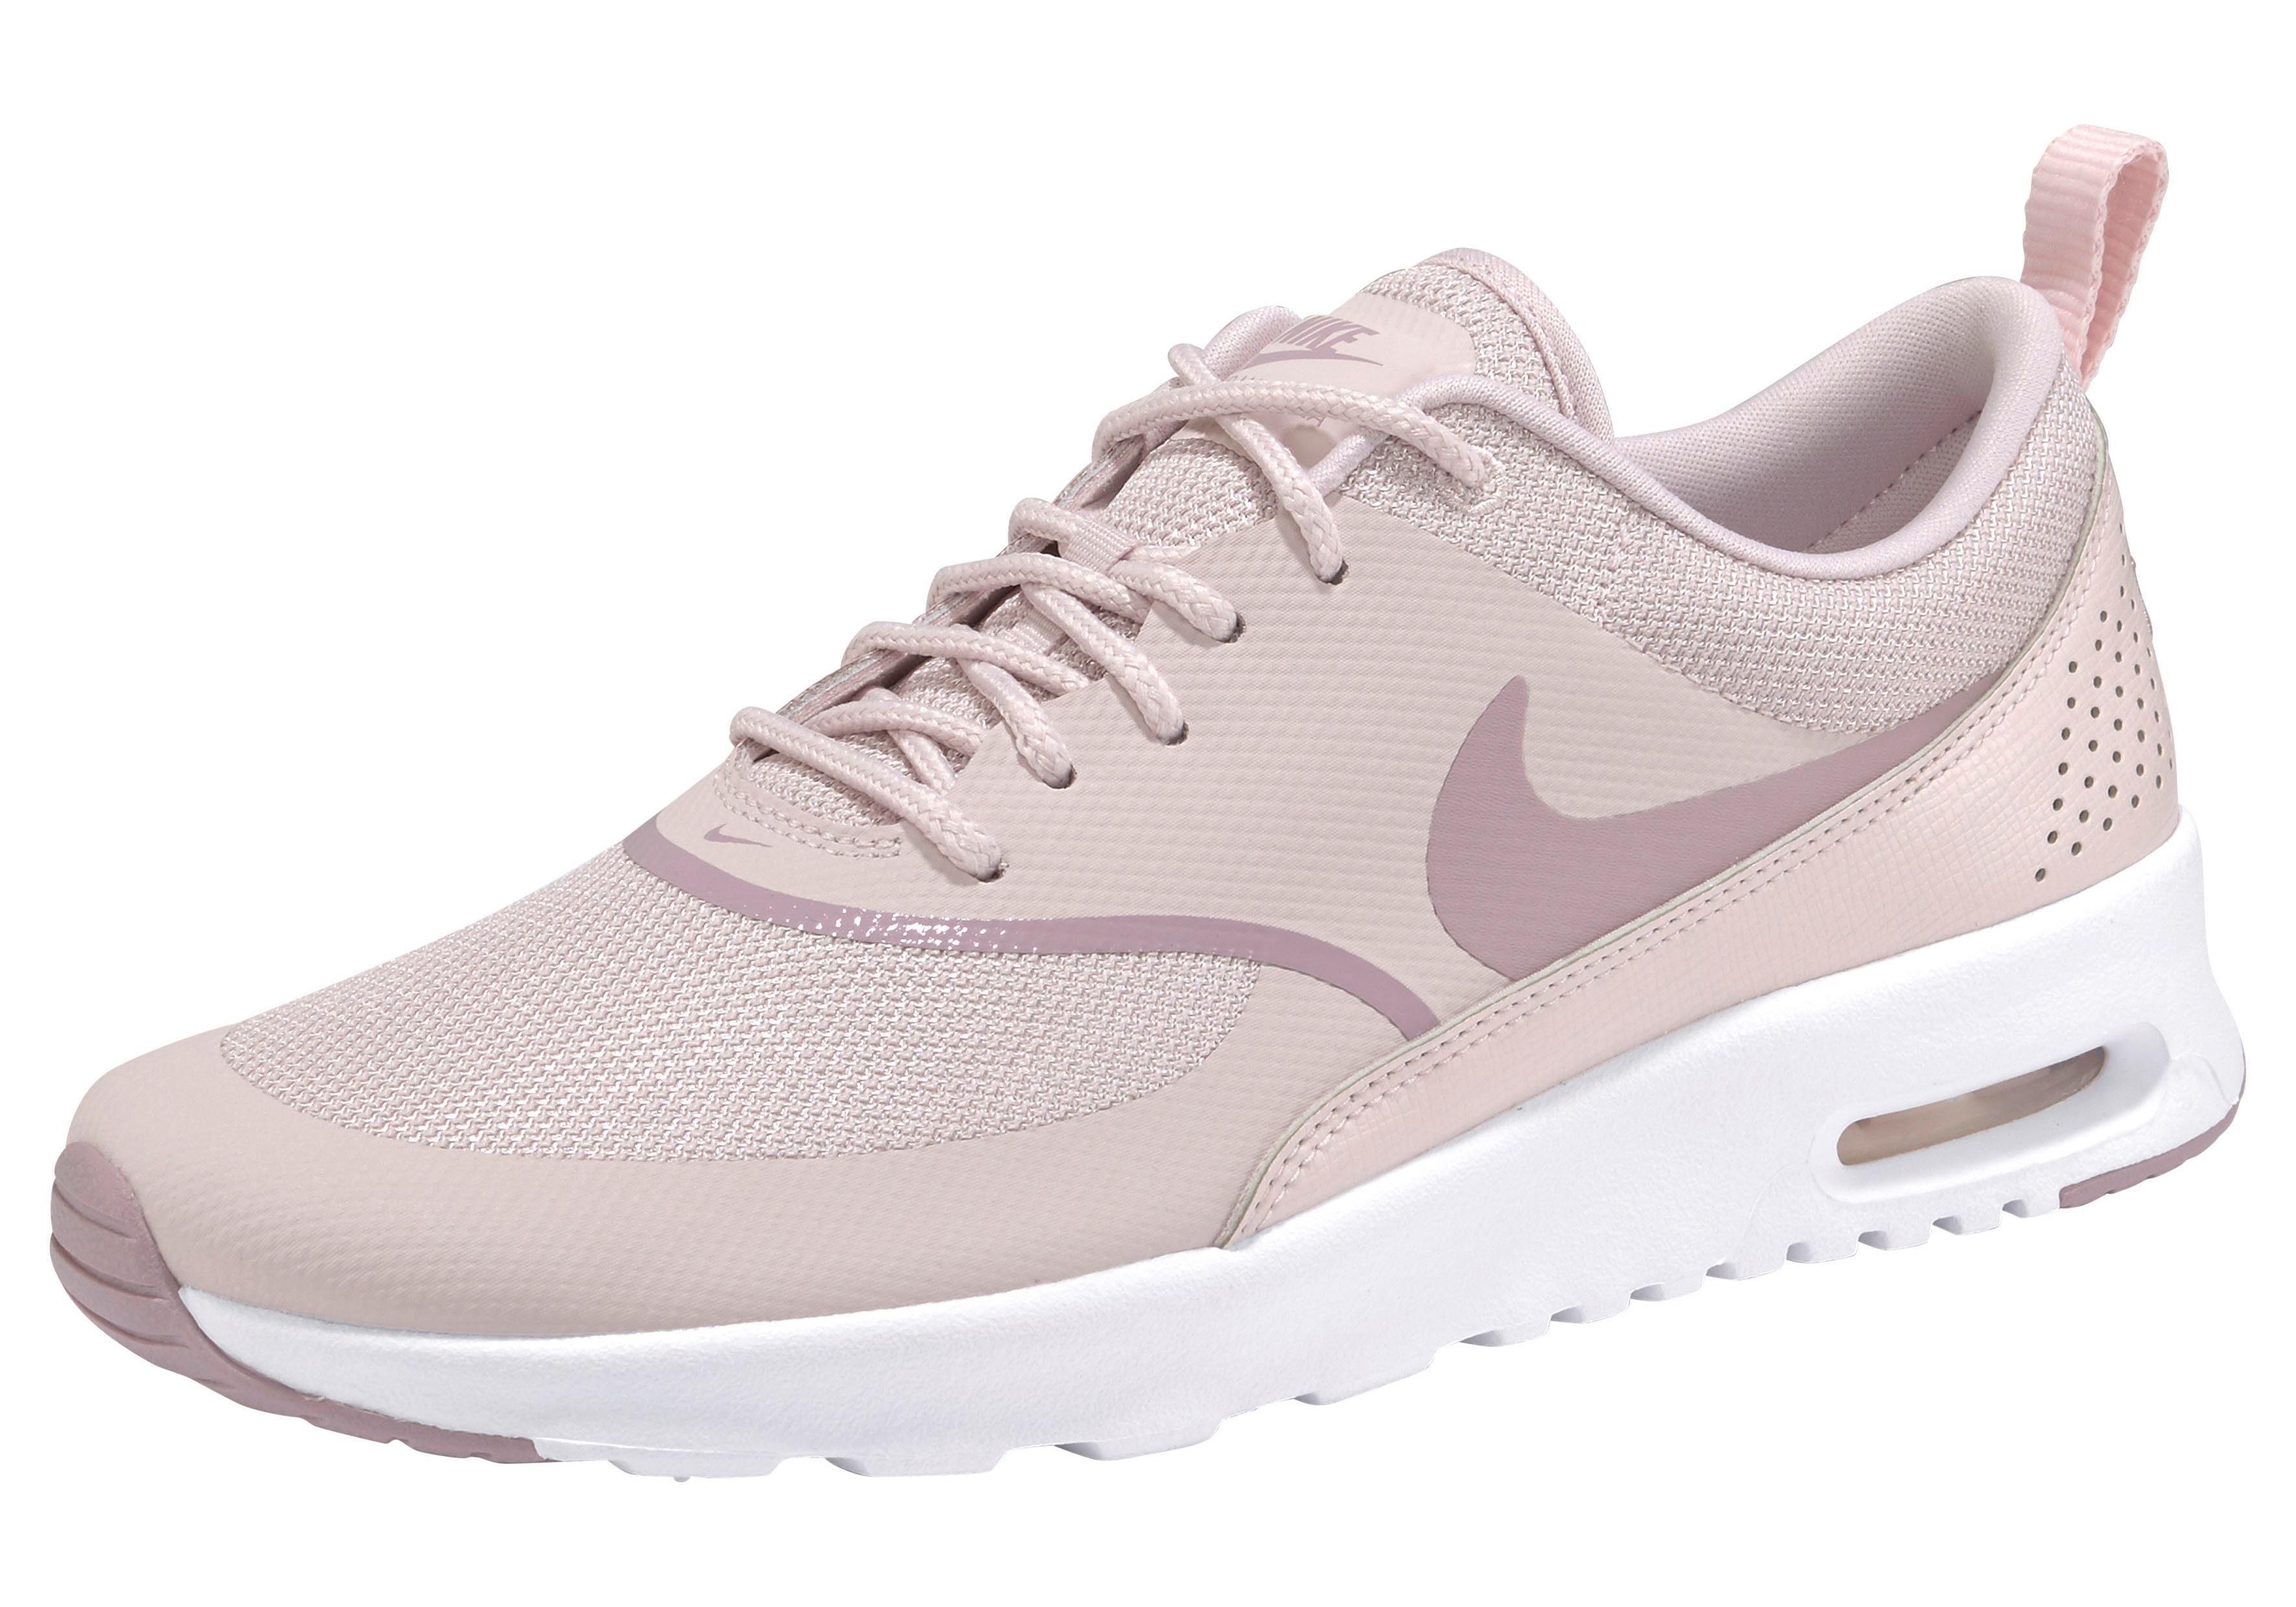 Nike Sportswear »Air Max Thea« Sneaker kaufen | OTTO